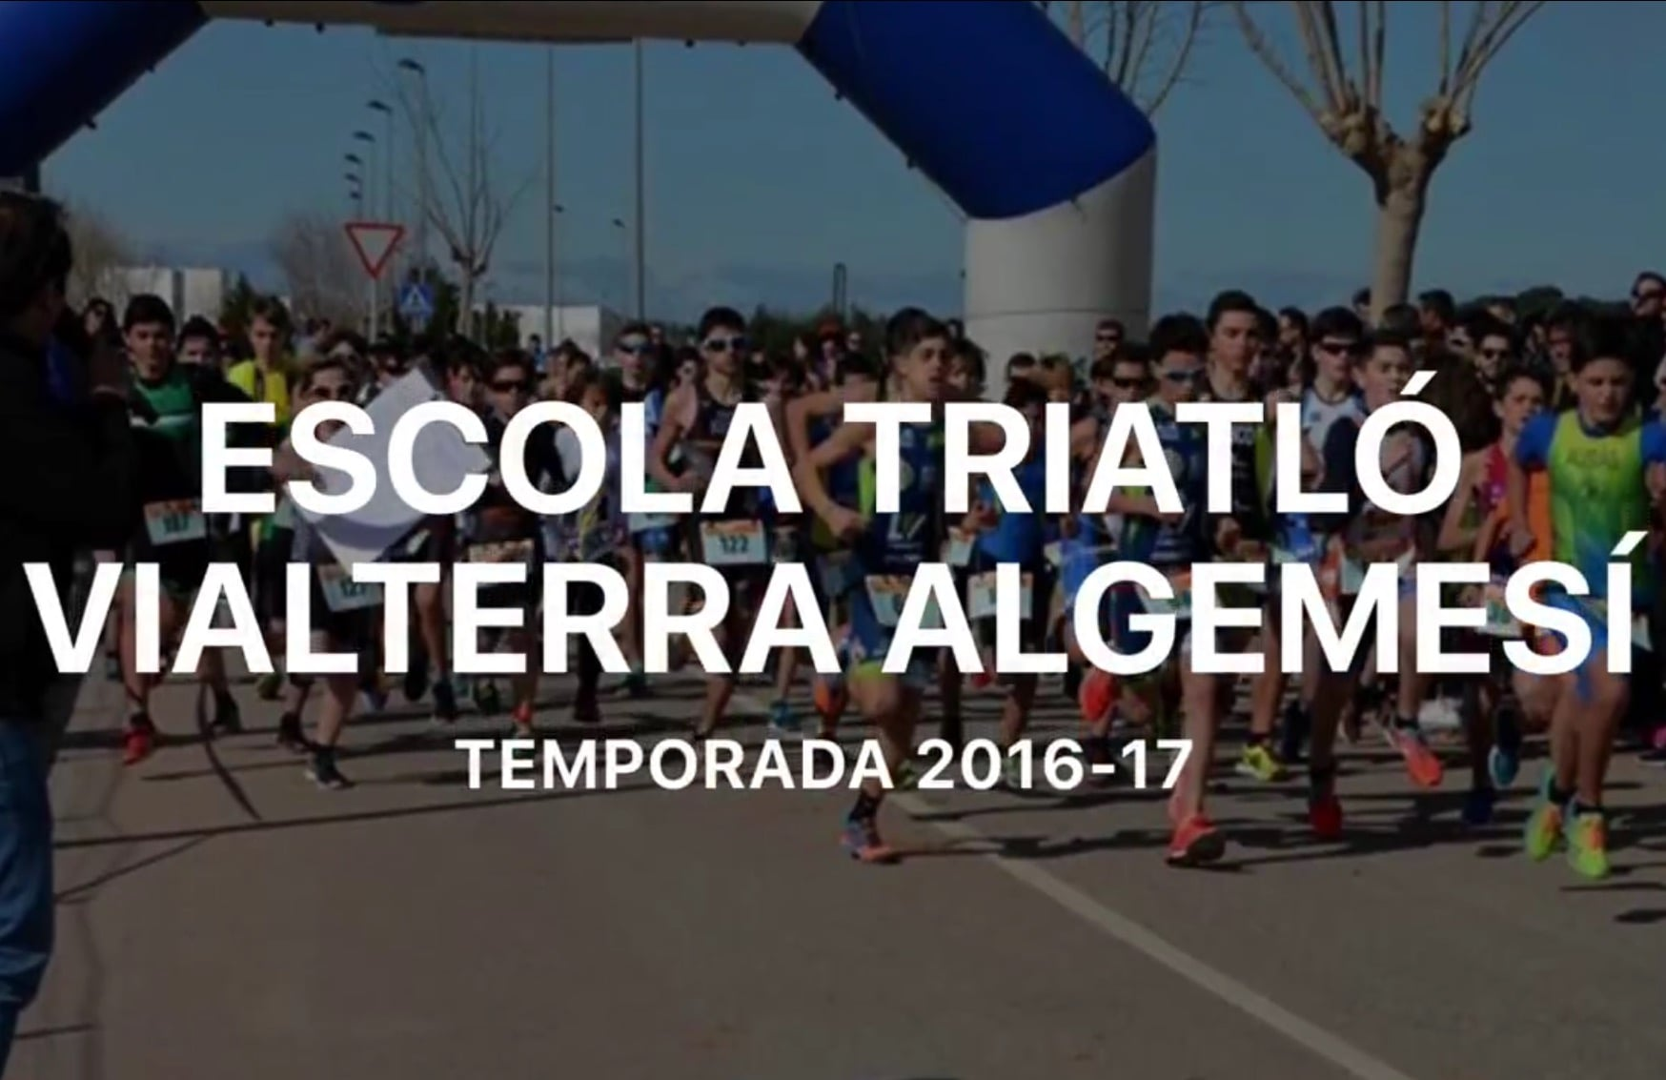 Escuela de Triatlón Vialterra Algemesí 2016-2017